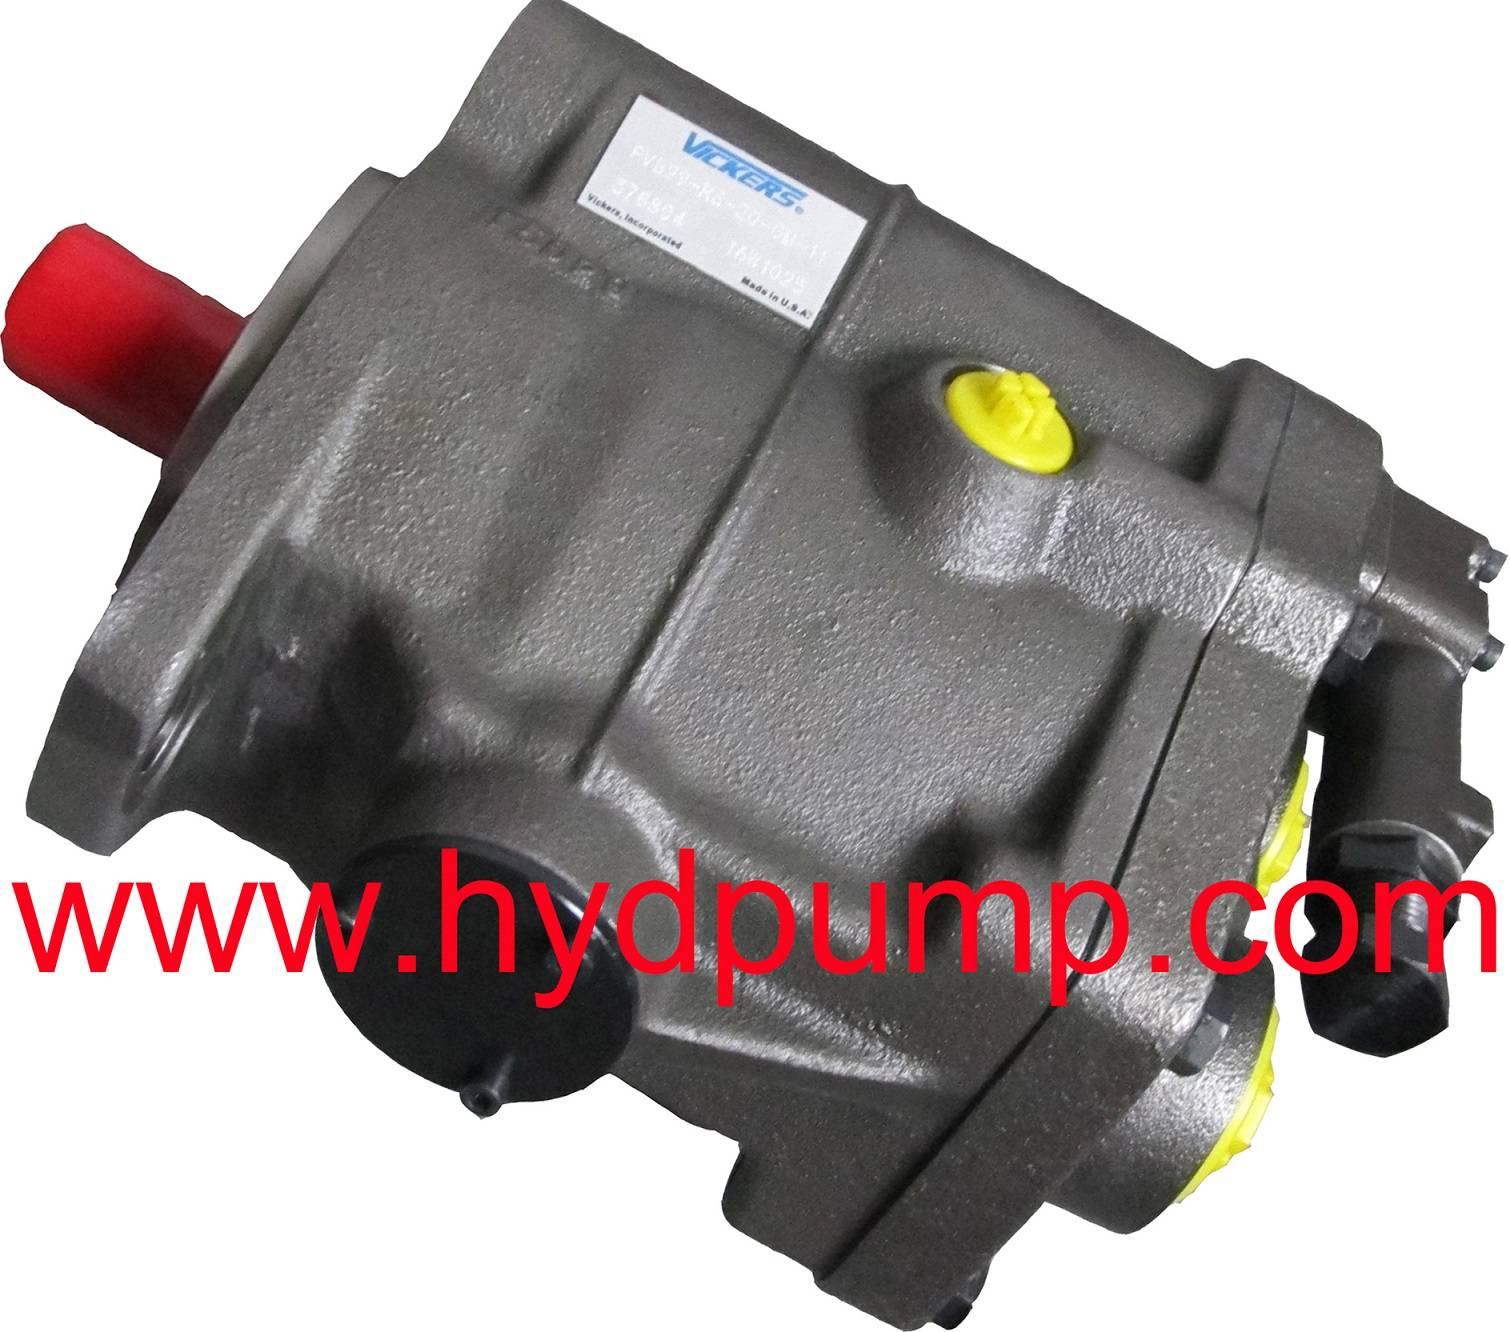 Vickers Hydraulic Piston Pump motor PVB of PVB5, PVB6, PVB10, PVB15, PVB20, PVB29, PVB45, MFB motor